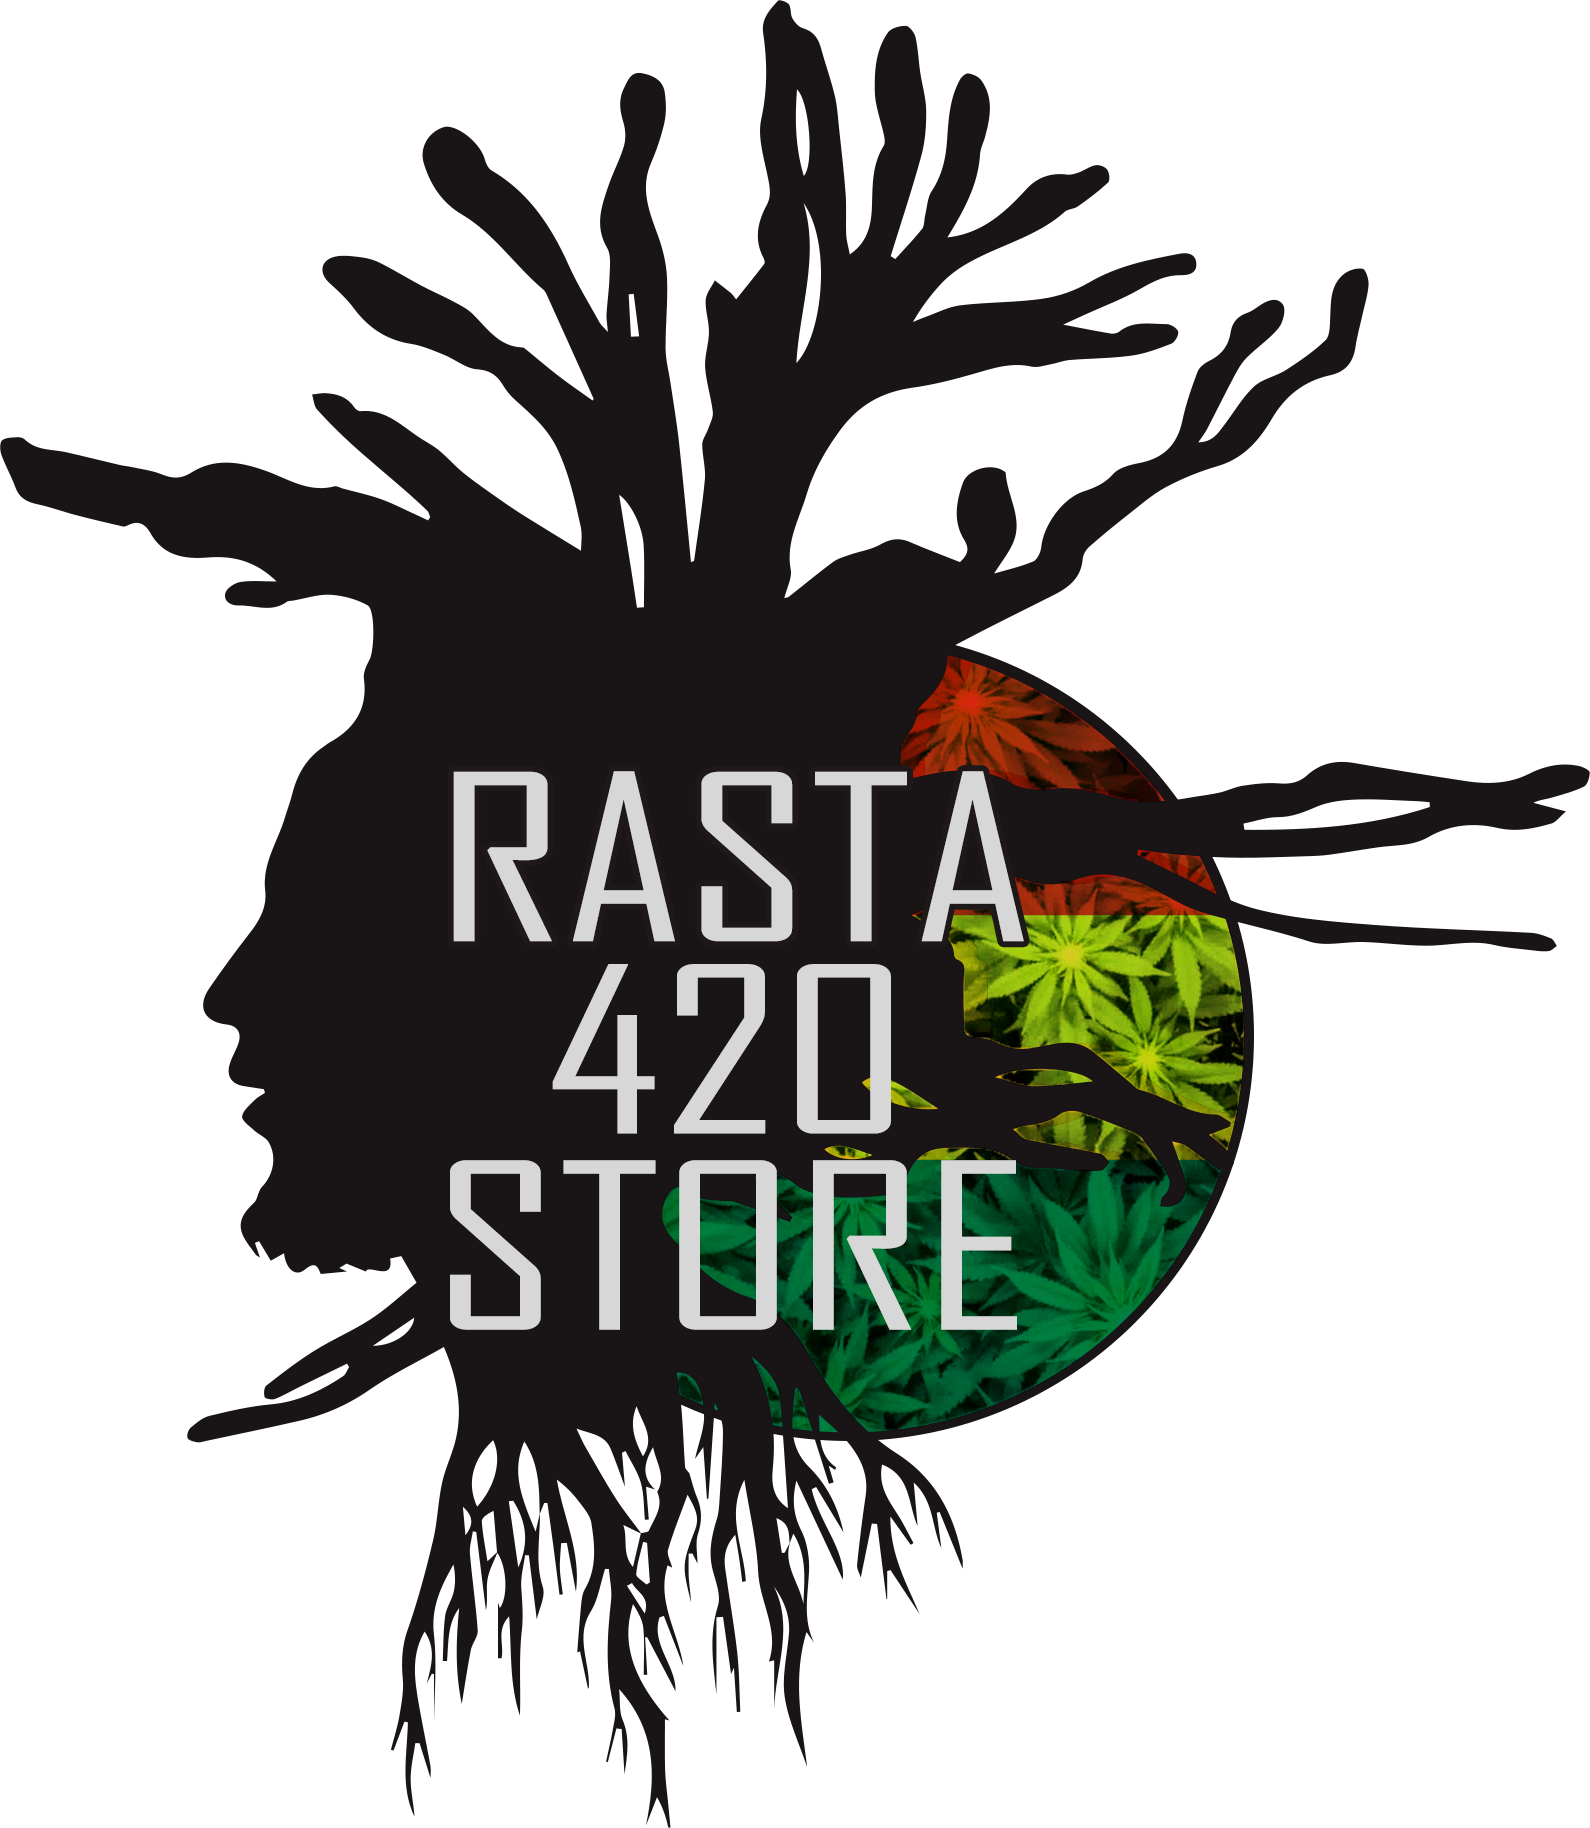 Rasta 420 store teespring